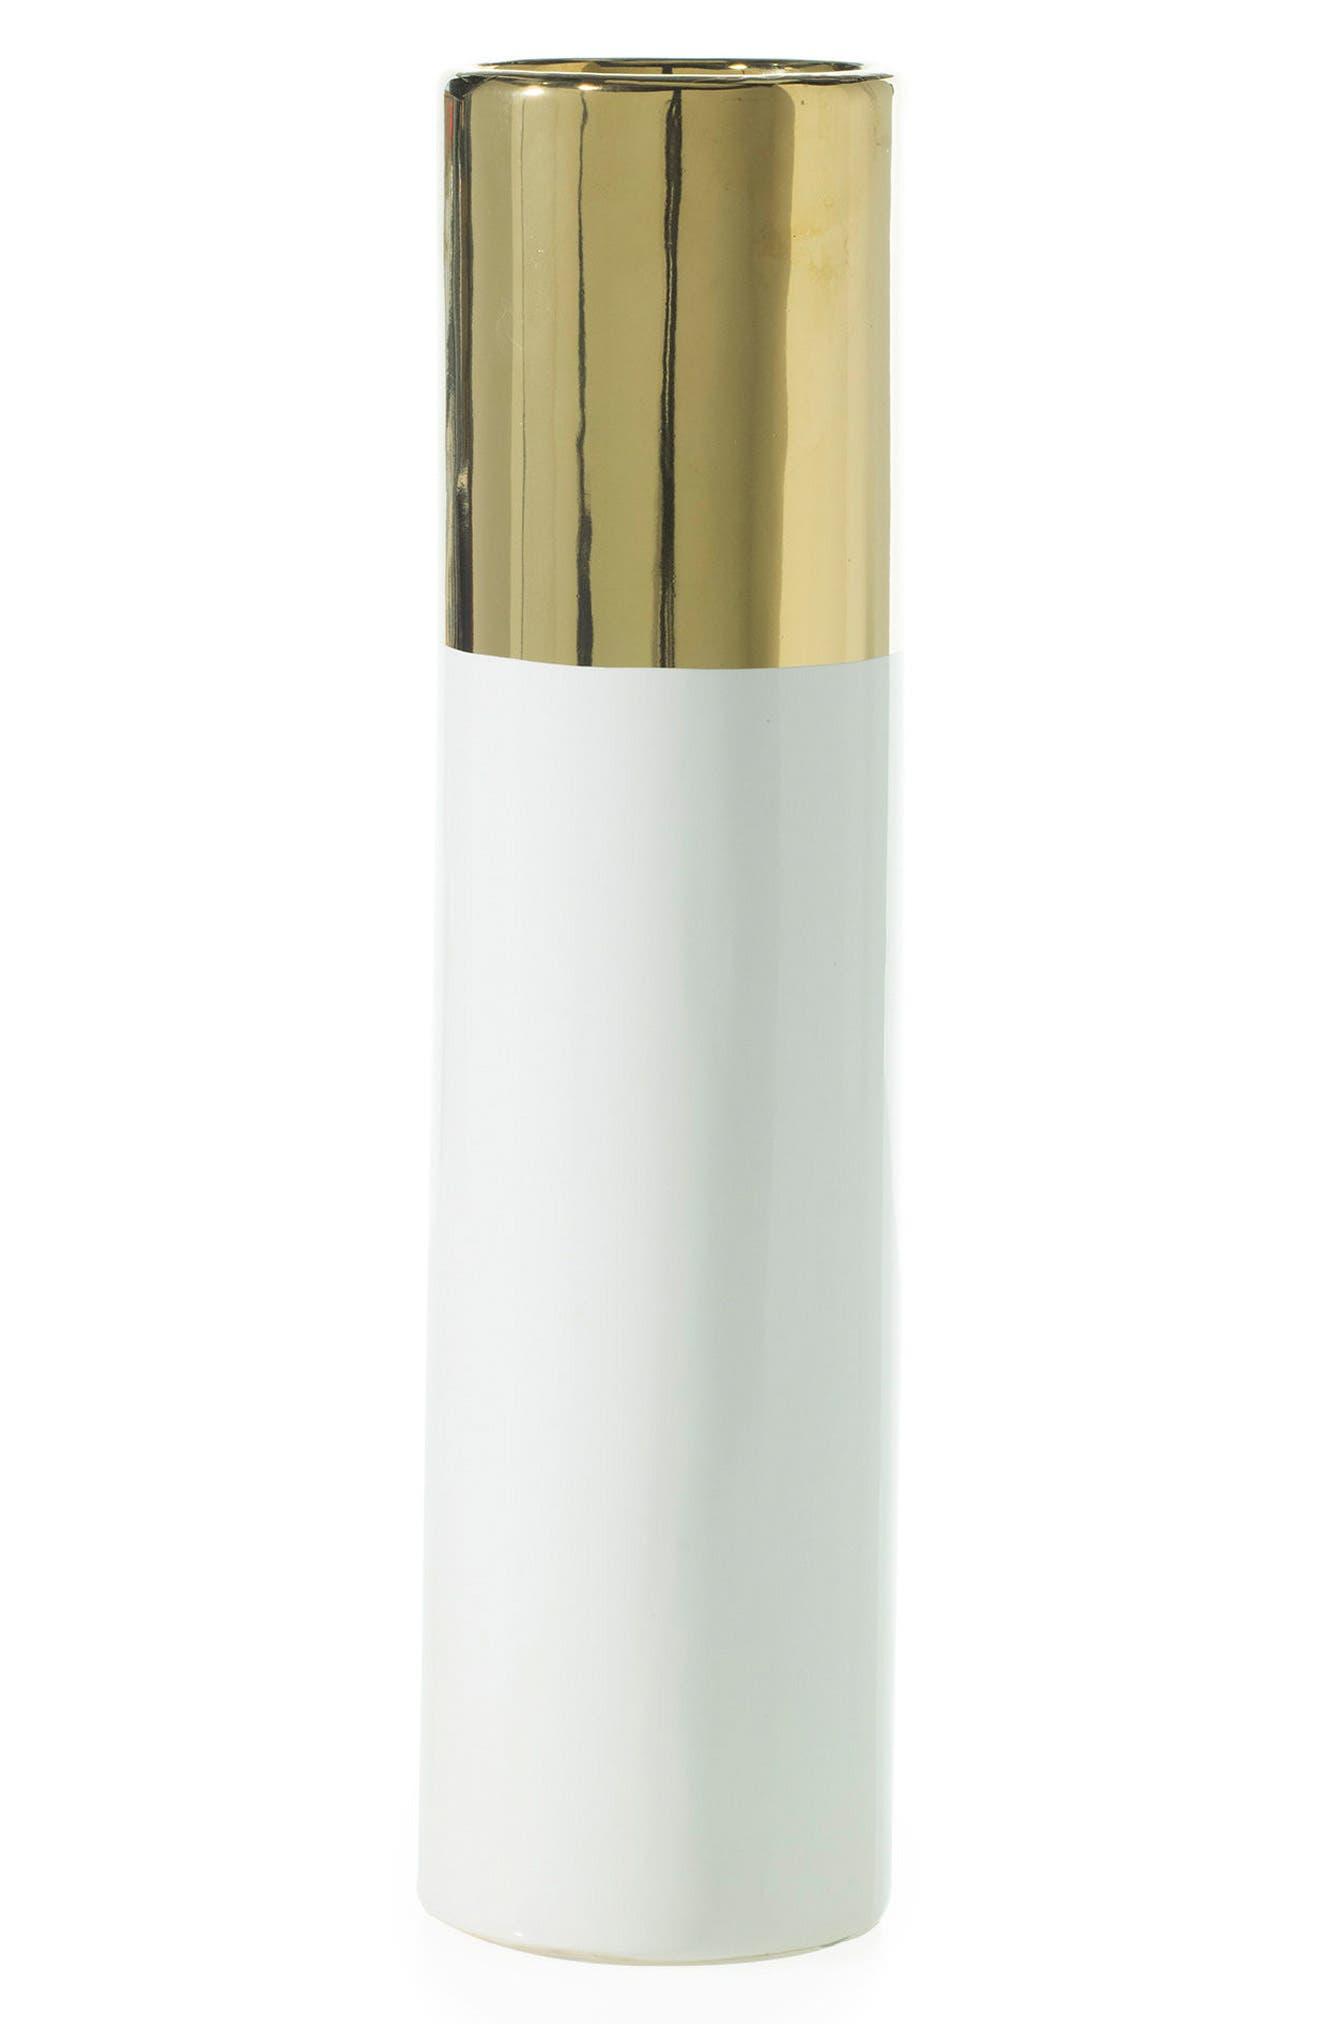 Main Image - Accent Decor Klein Vase